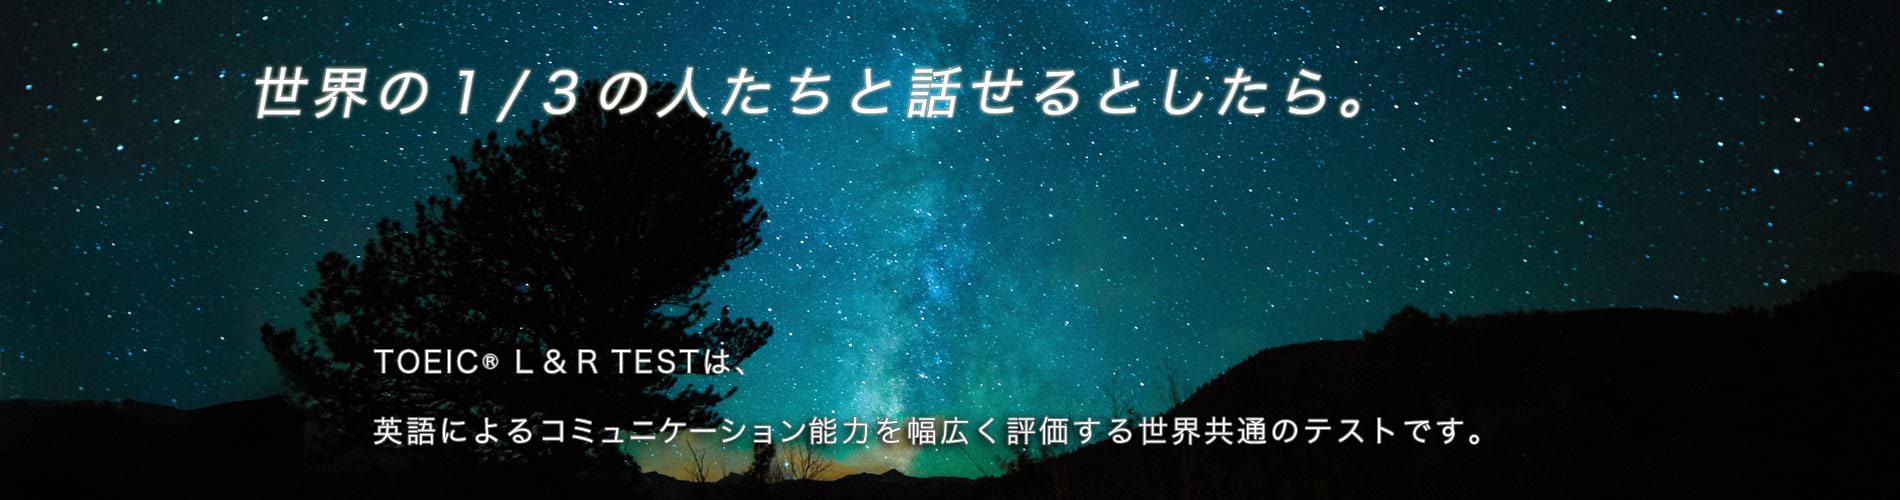 TOEIC®L & R TEST対策専門スクール 札幌英語教室CLOVERS top_slideshow 01